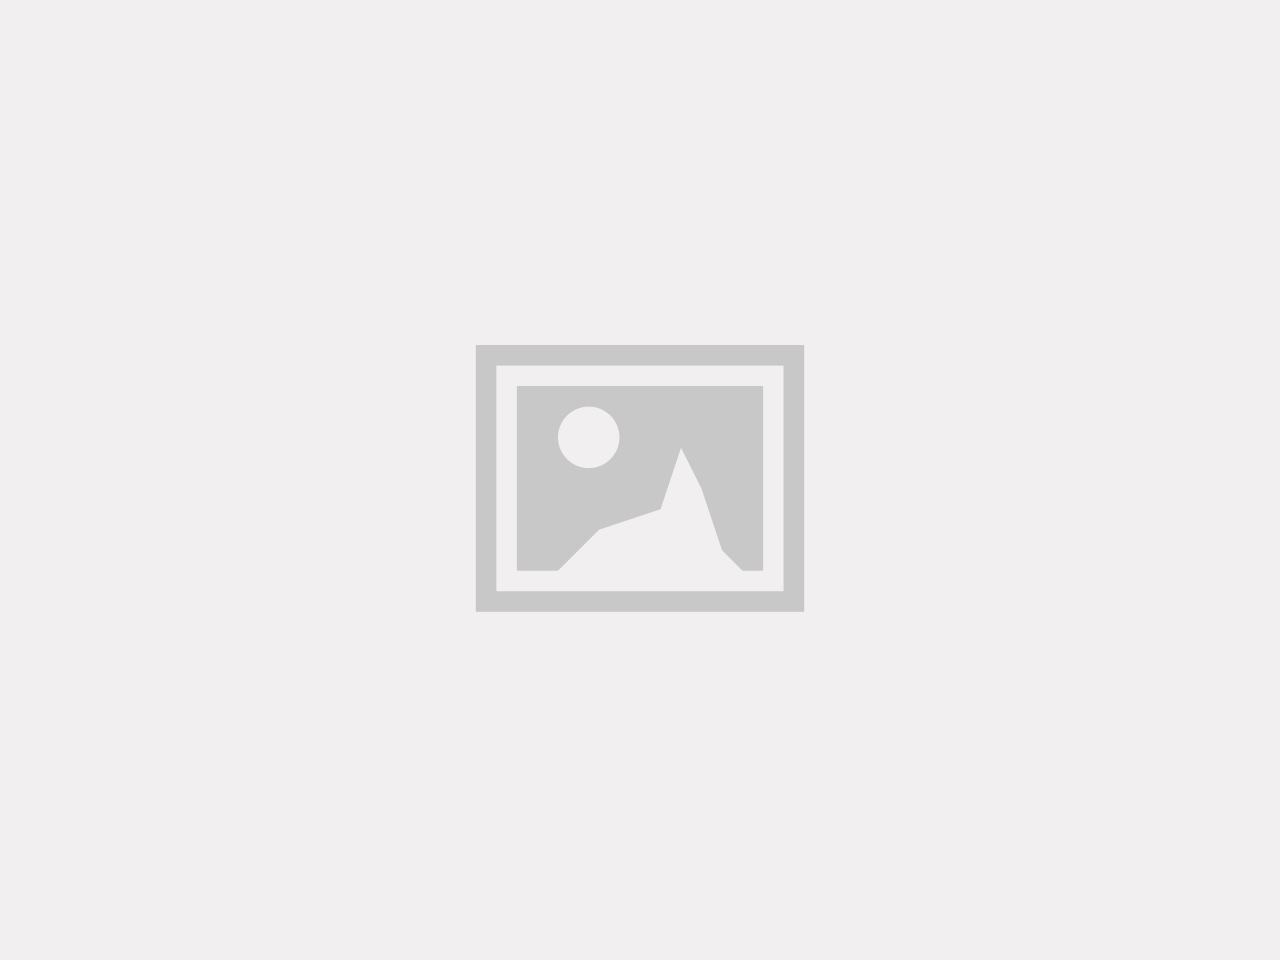 Timbernook Certified Provider